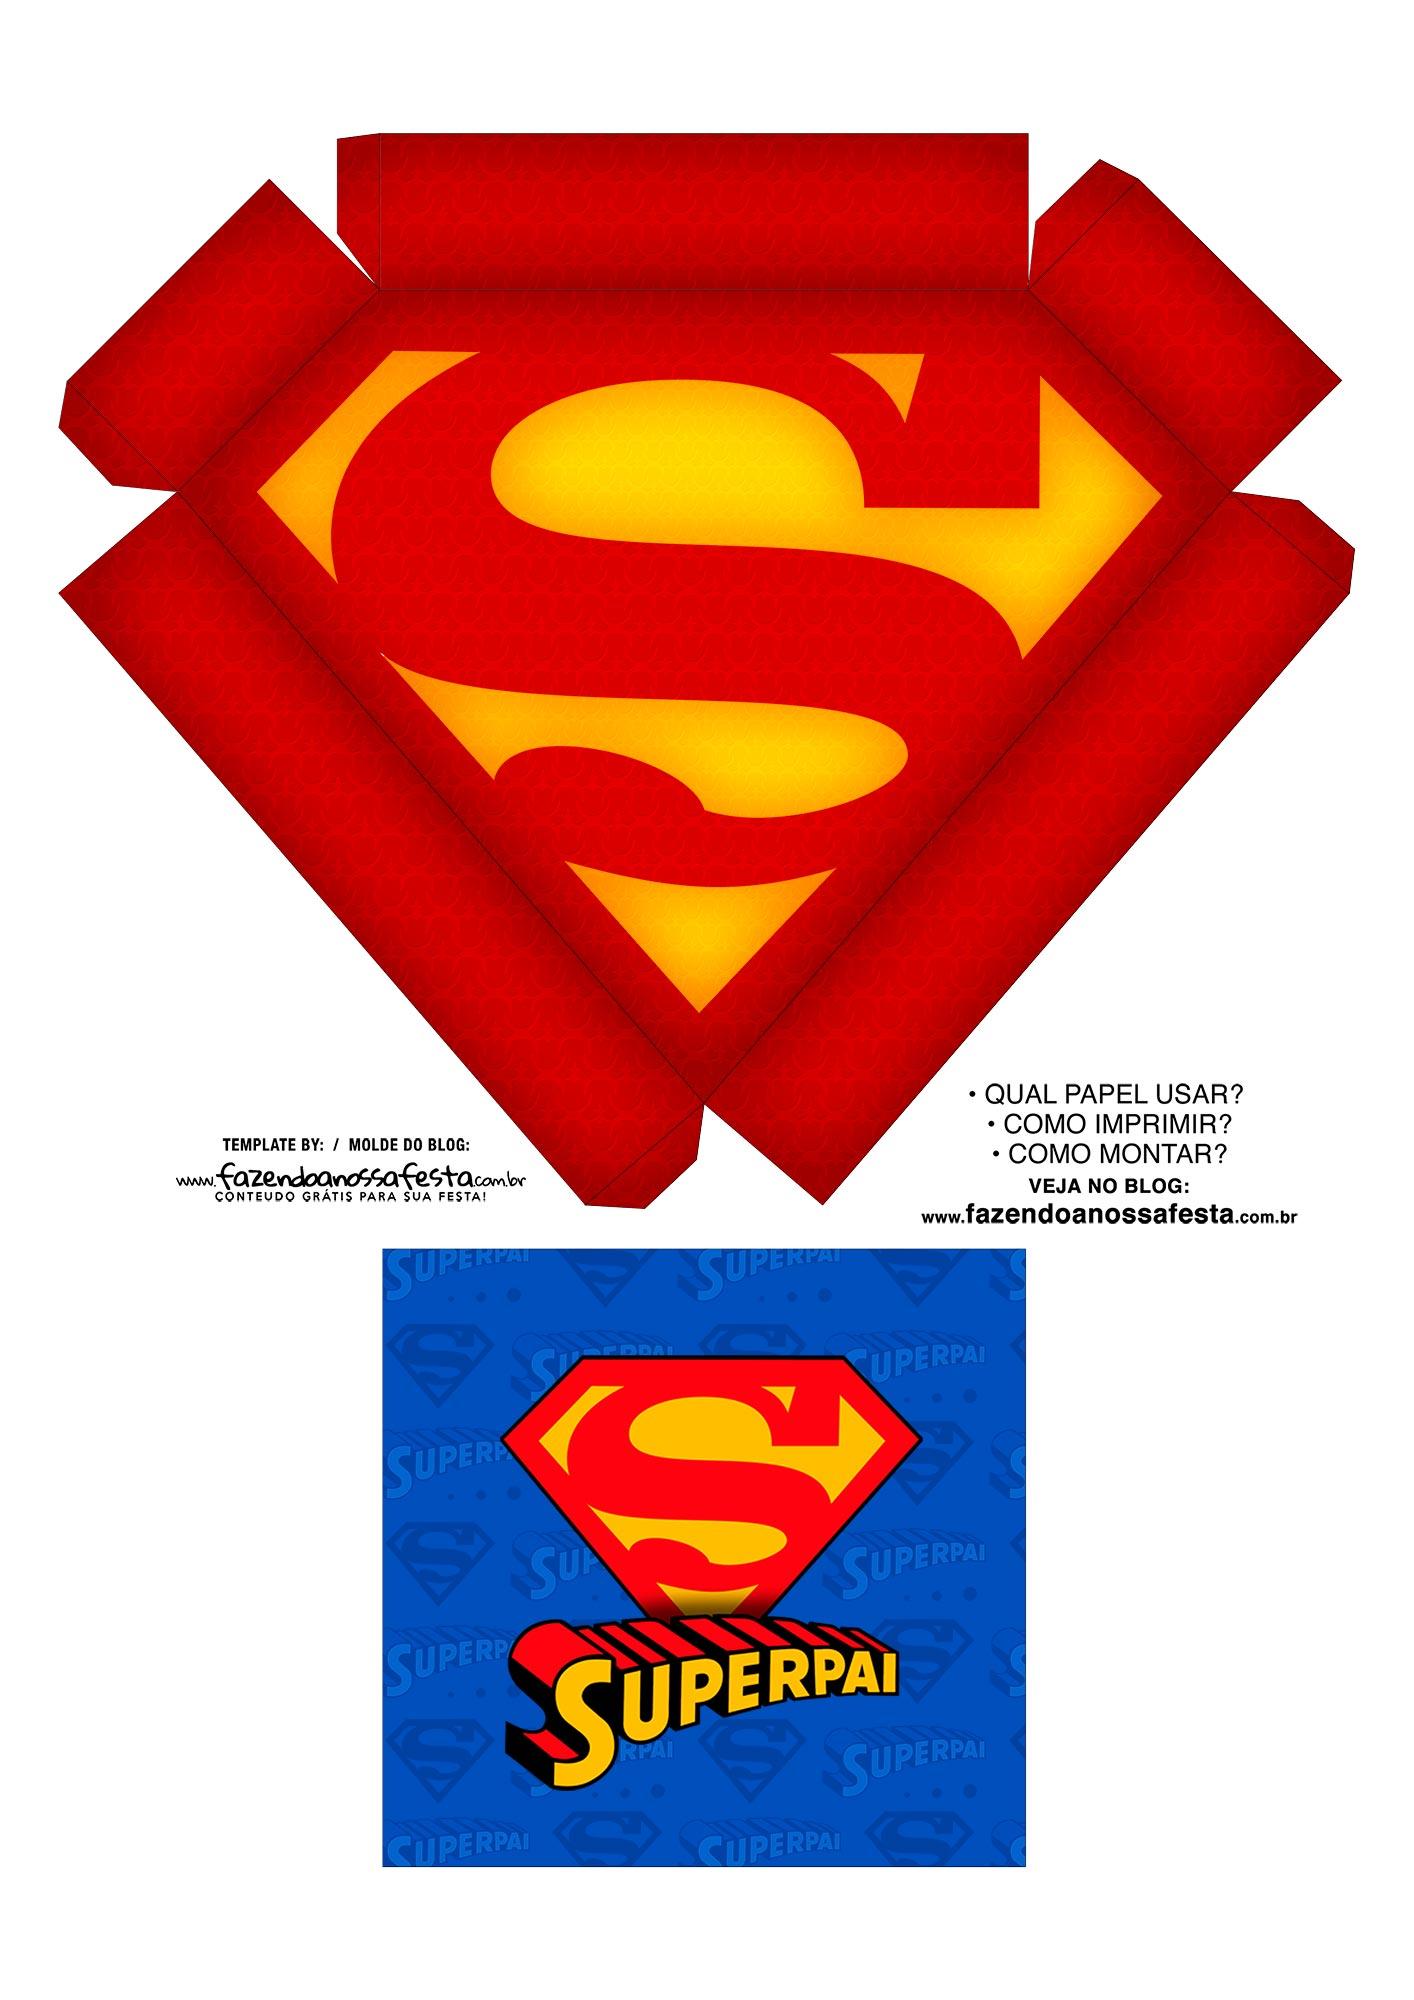 Caixa Explosao Super Pai molde 1